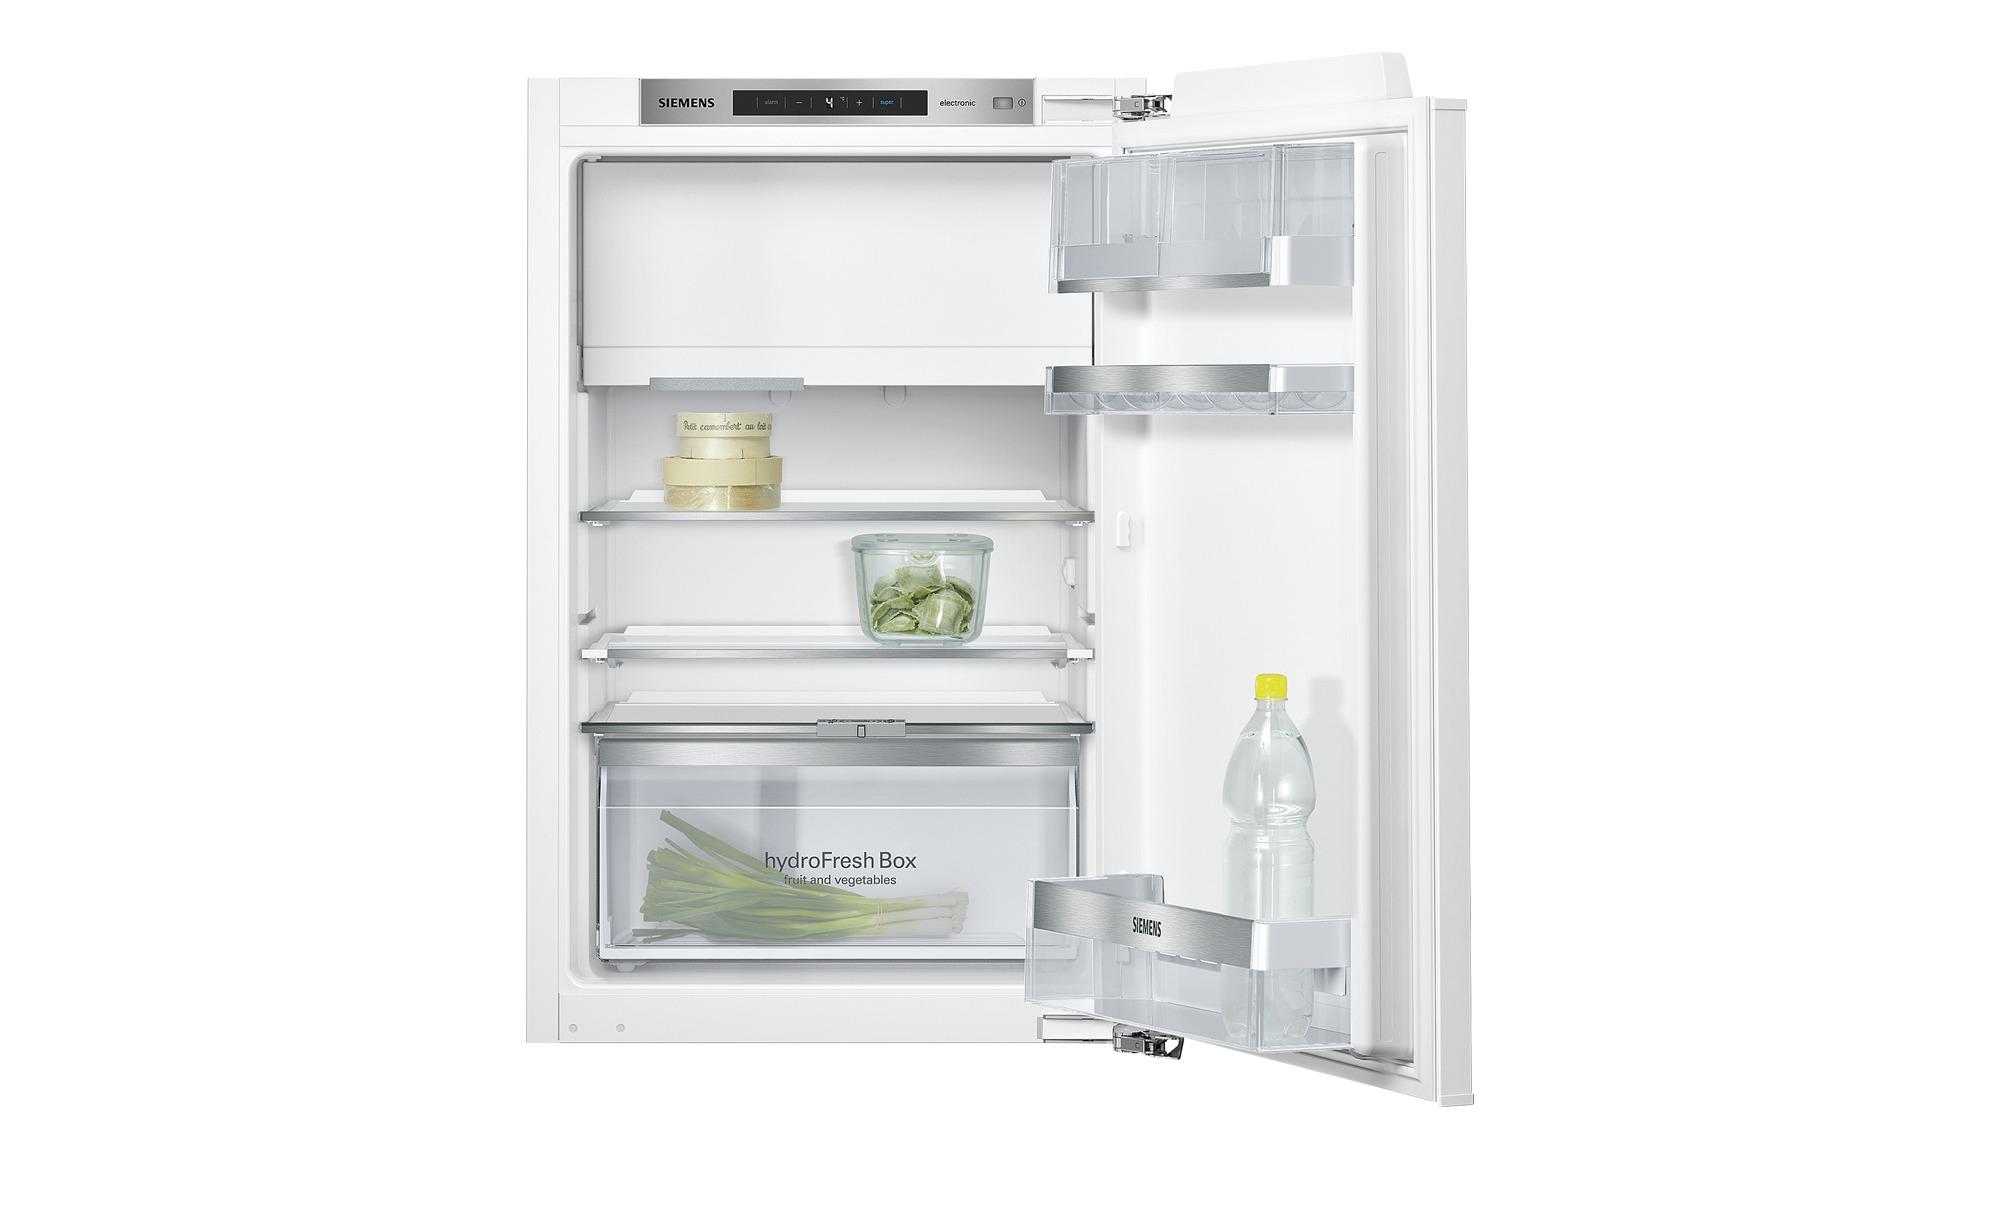 Siemens Kühlschrank Klein : Siemens einbau kühlschrank ki 22 lad 40 möbel höffner